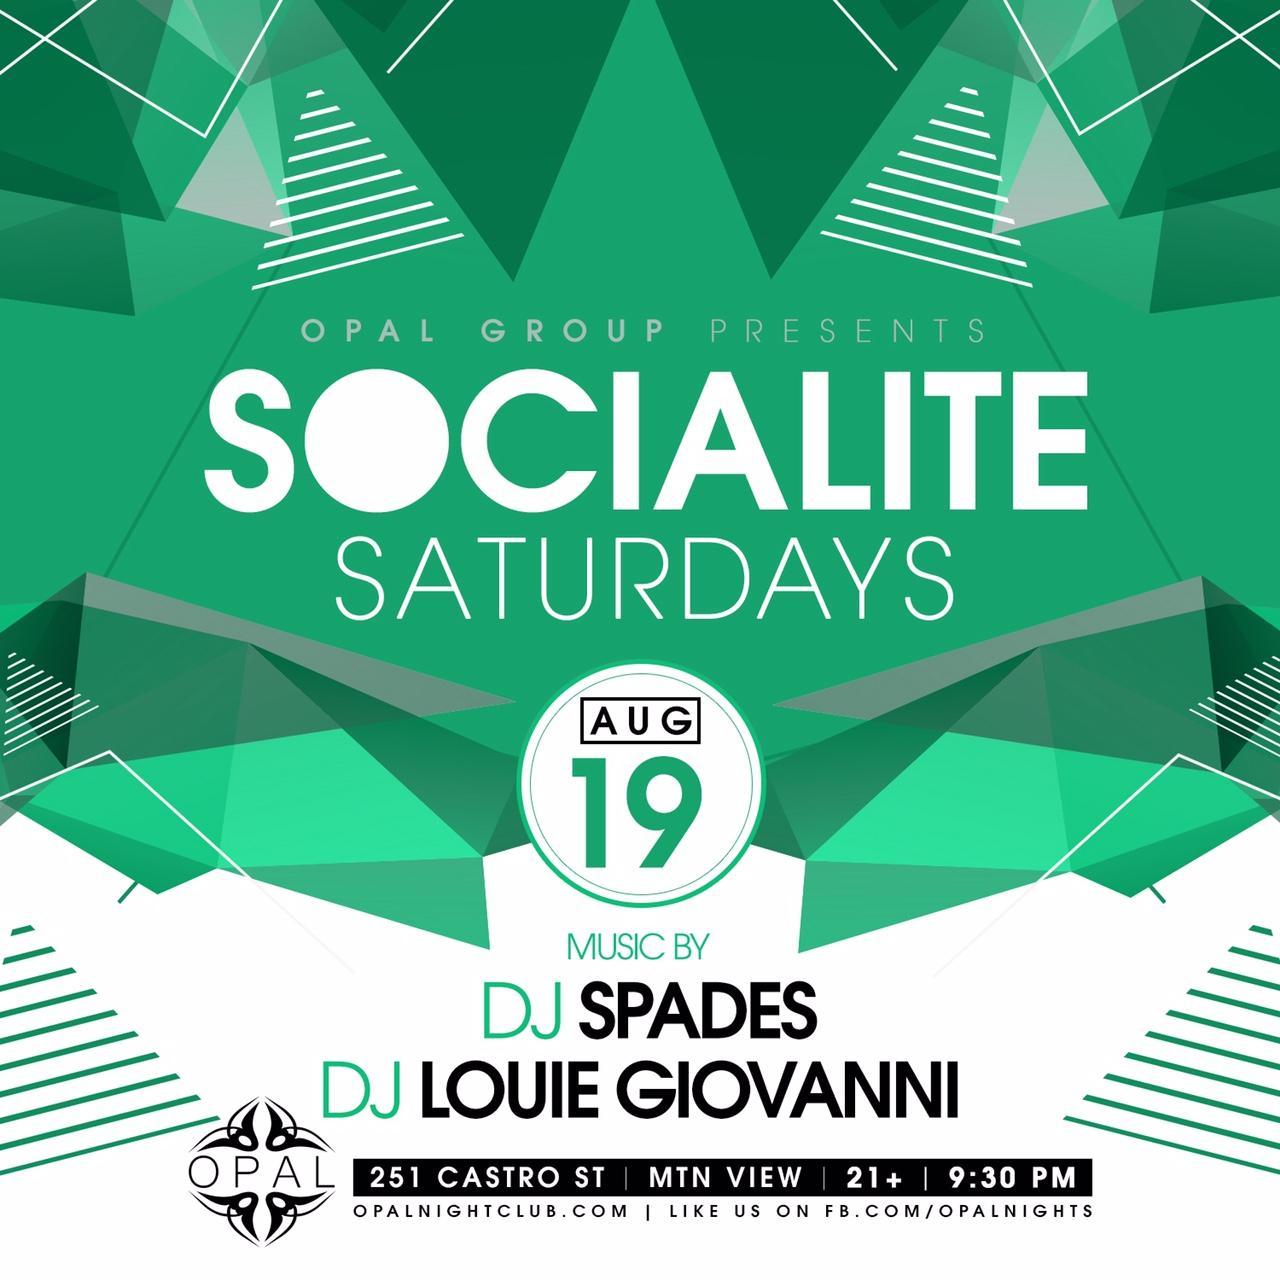 Socialite Saturday